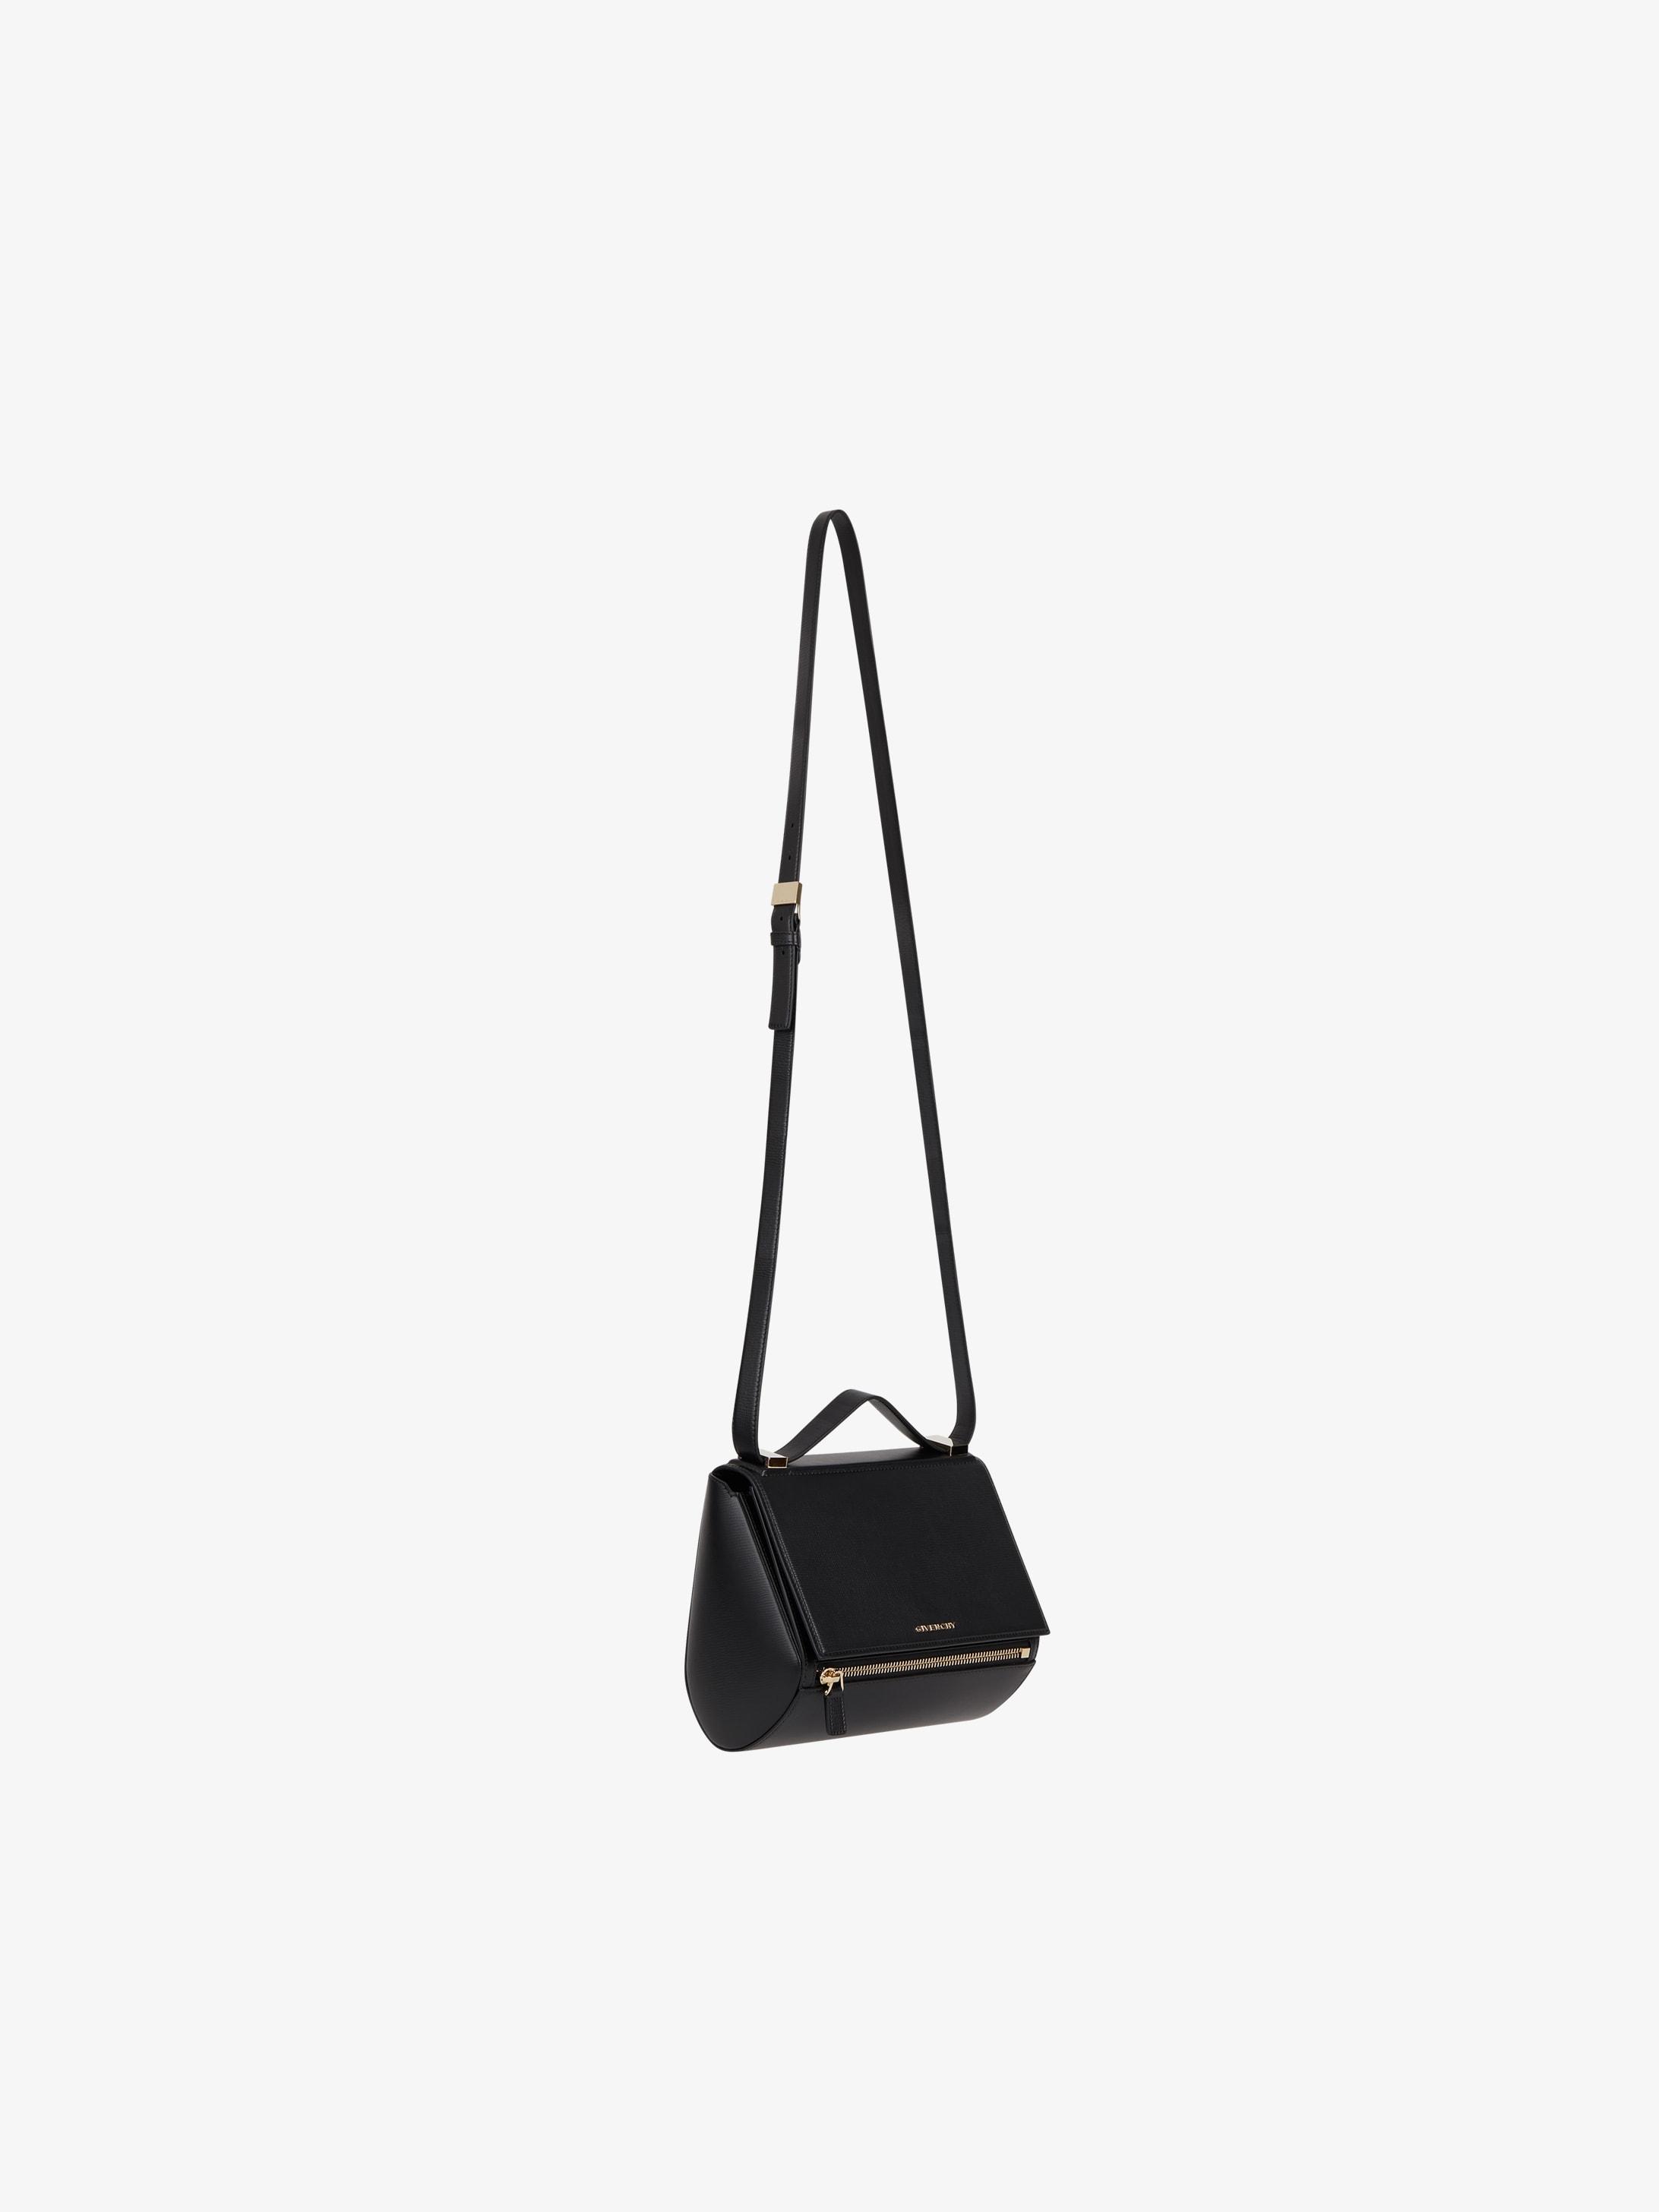 929be084bac Medium Pandora box bag | GIVENCHY Paris